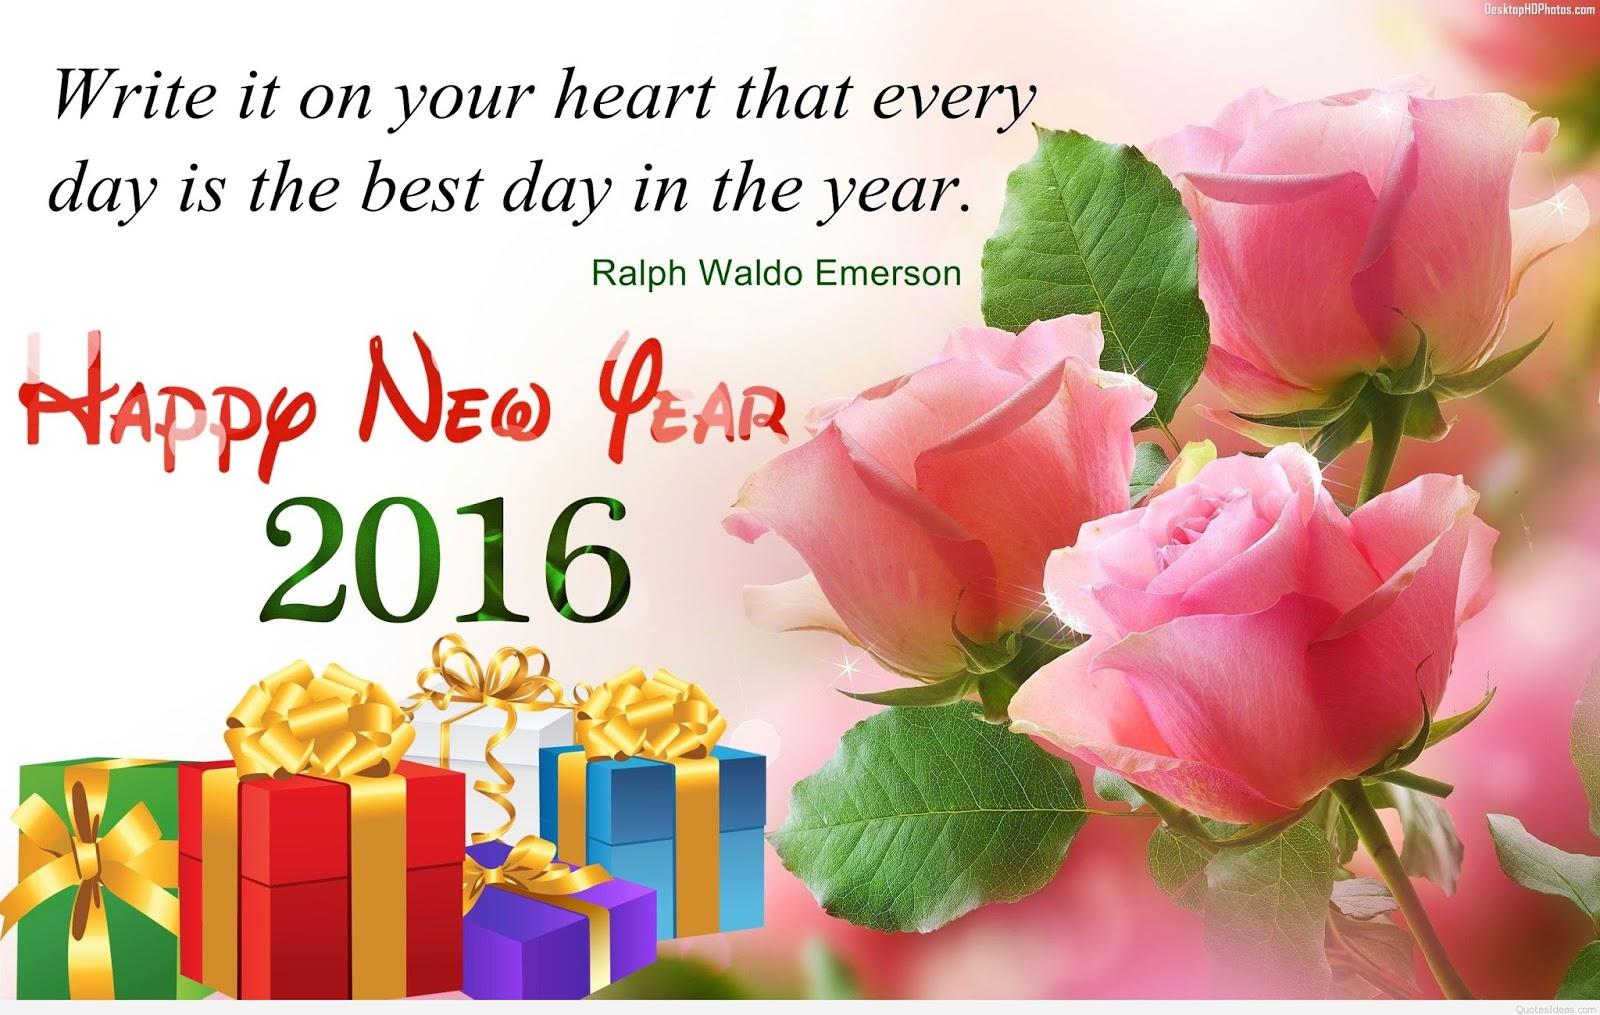 Happy New Year 2016 Slogans Happy New Year 2016 Hd Wallpaper